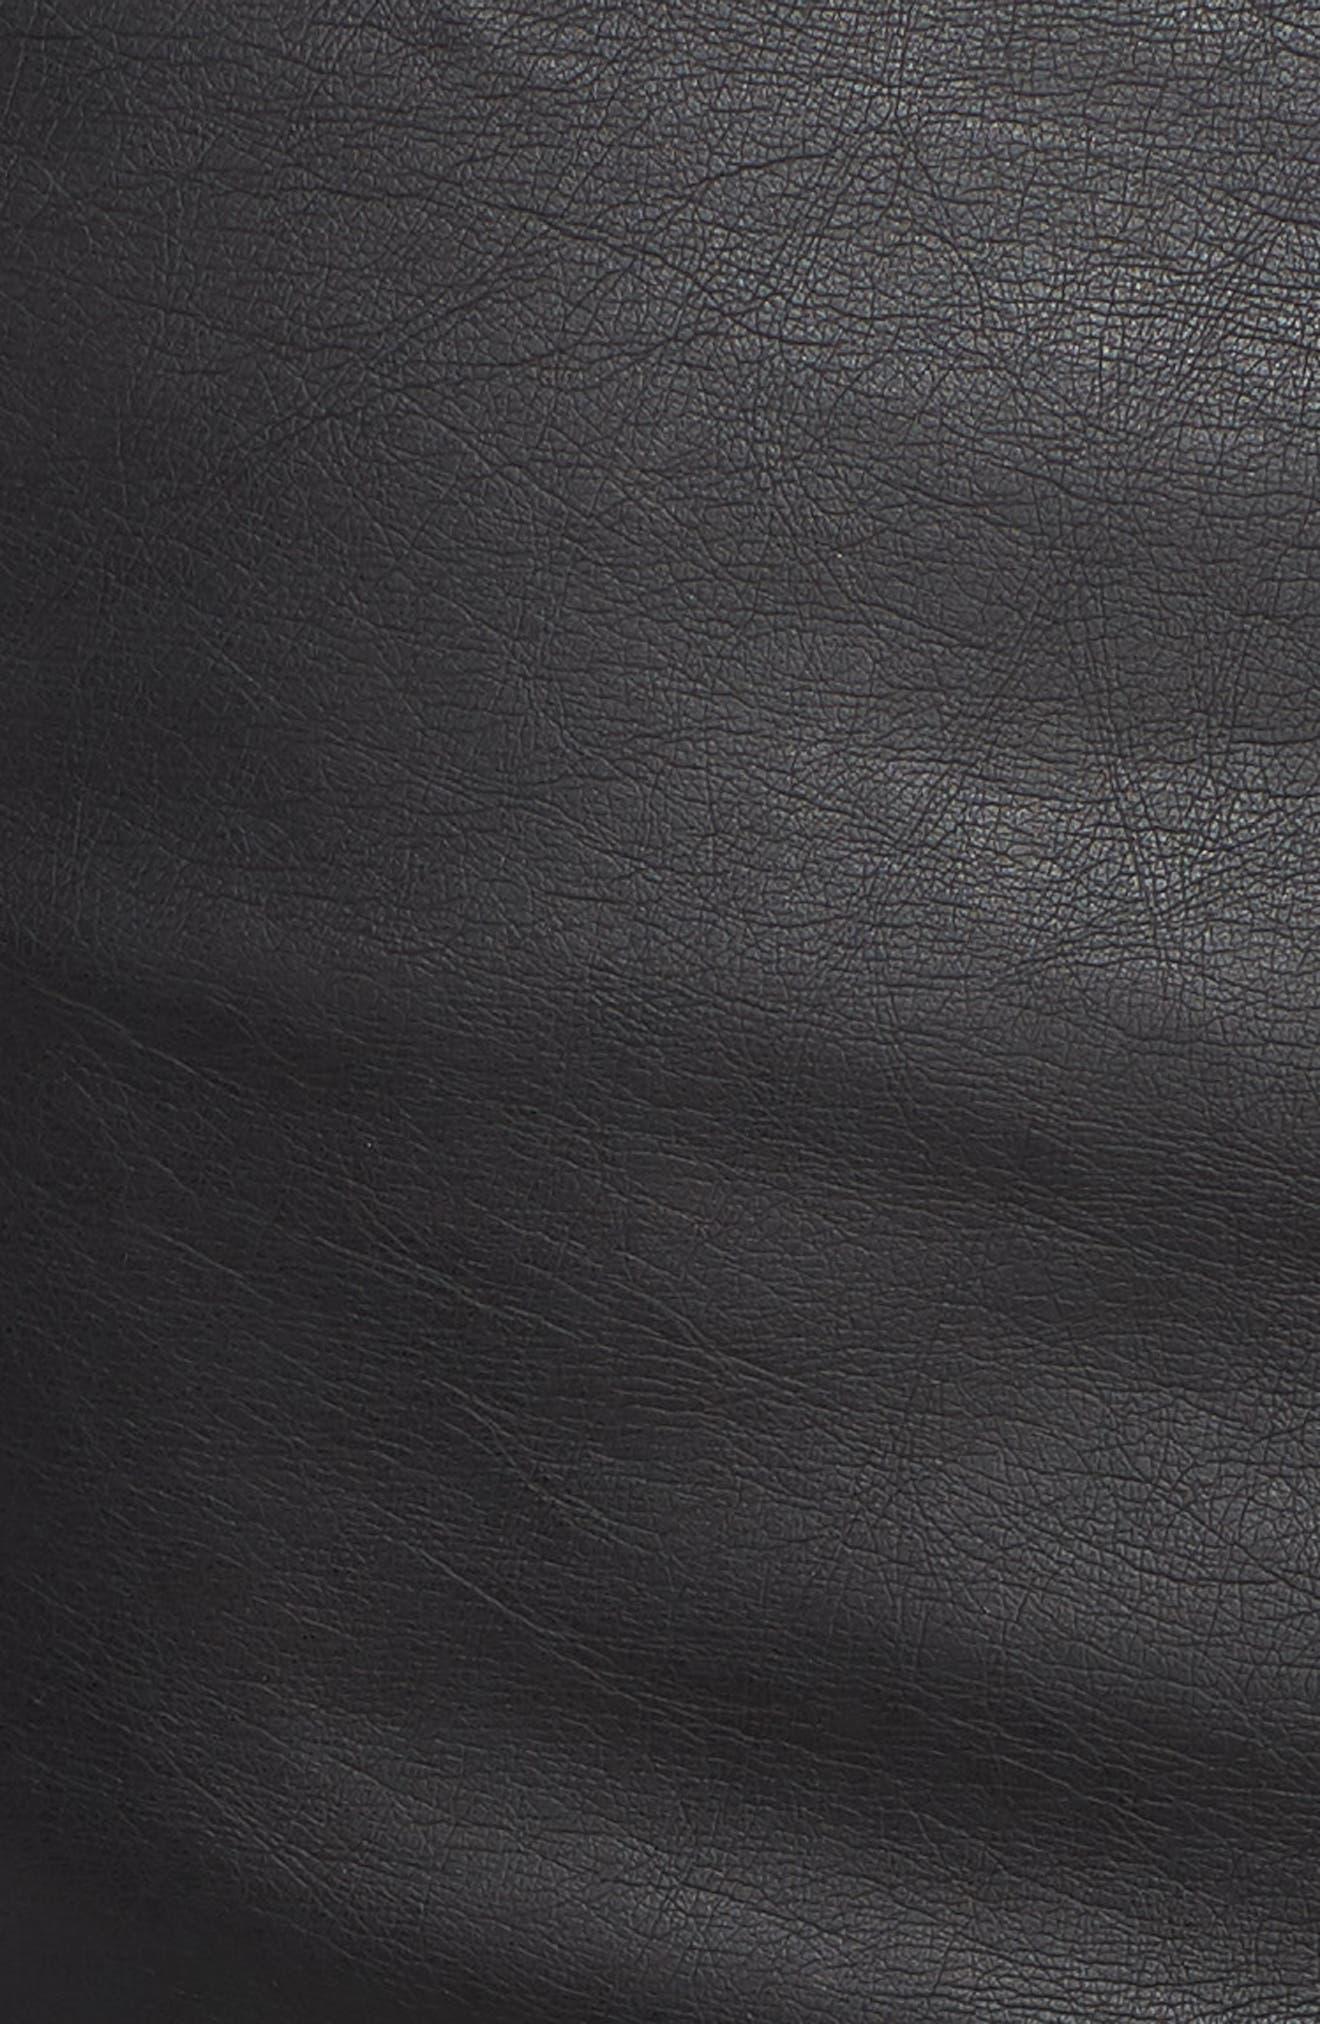 Ribbed Drape Front Faux Leather Jacket,                             Alternate thumbnail 7, color,                             BLACK